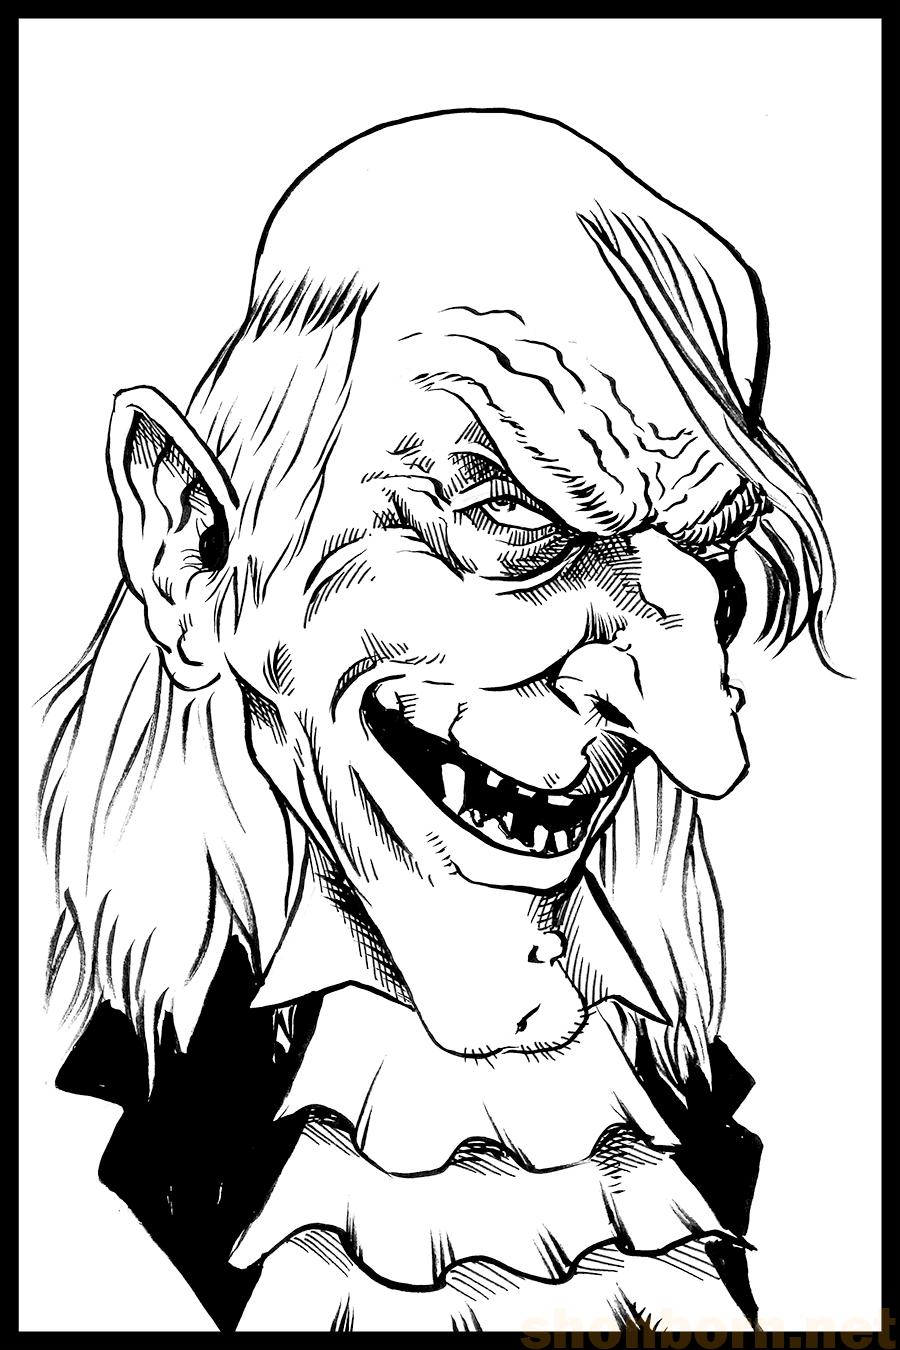 22. Uncle Creepy